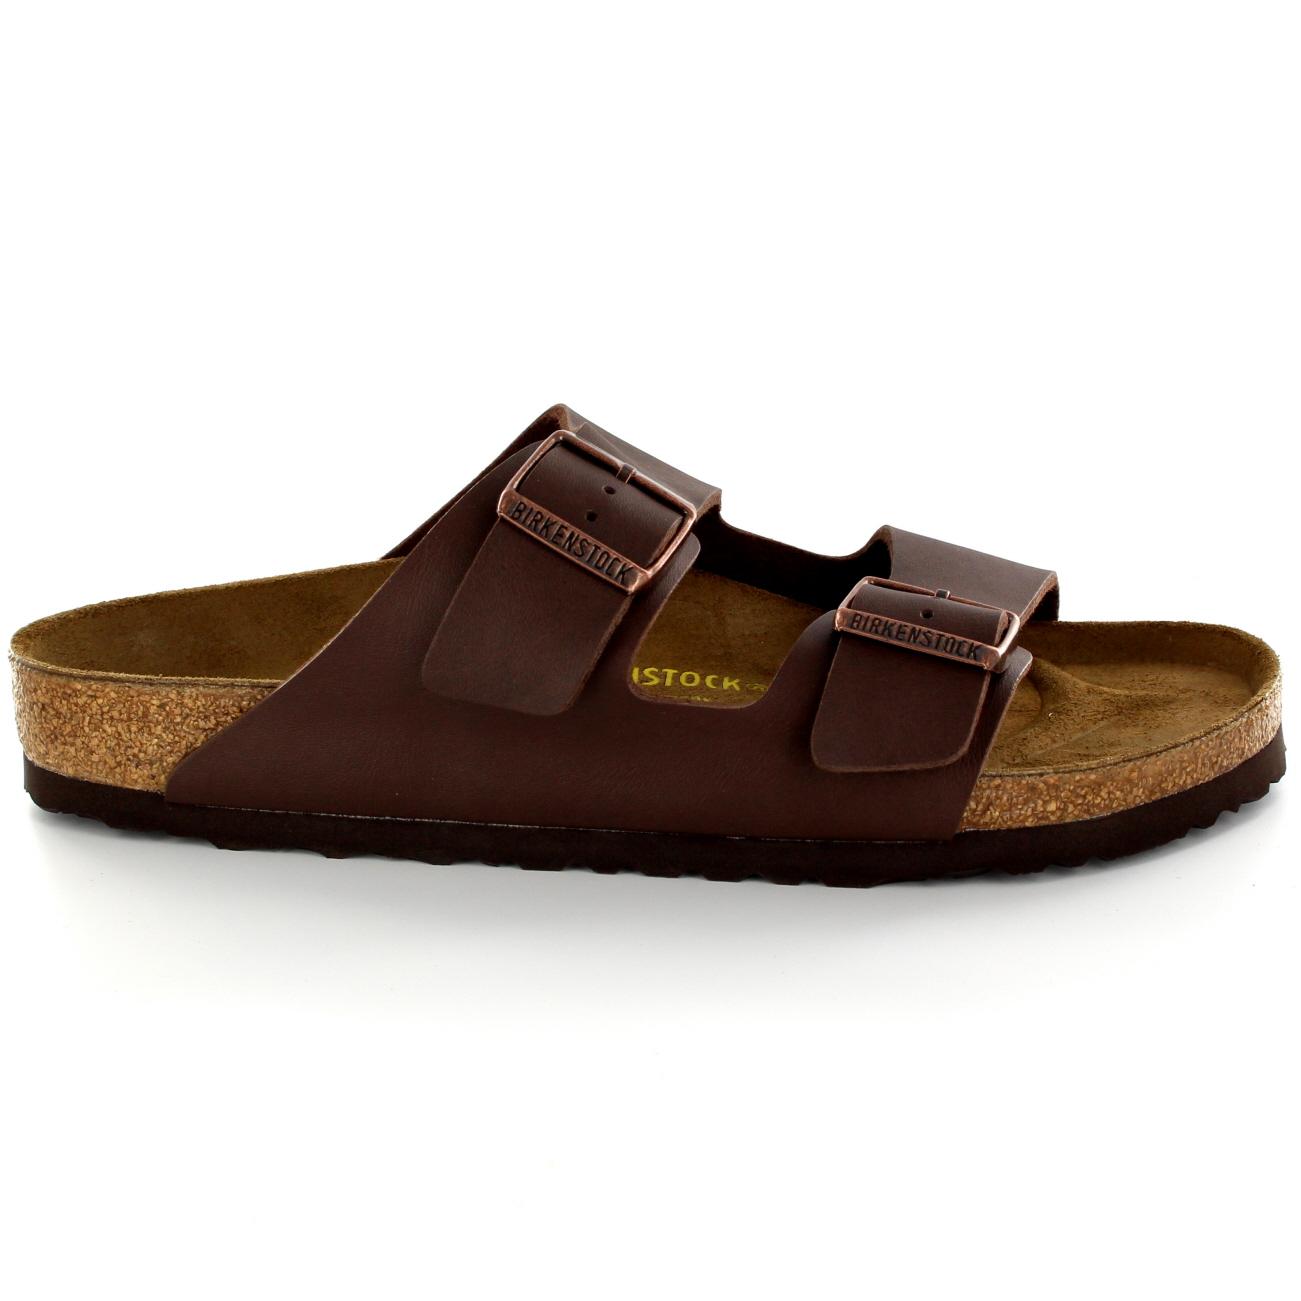 df6e170f8809 Mens Birkenstock Arizona Leather Buckle Summer Holiday Beach Sandals UK 6-13